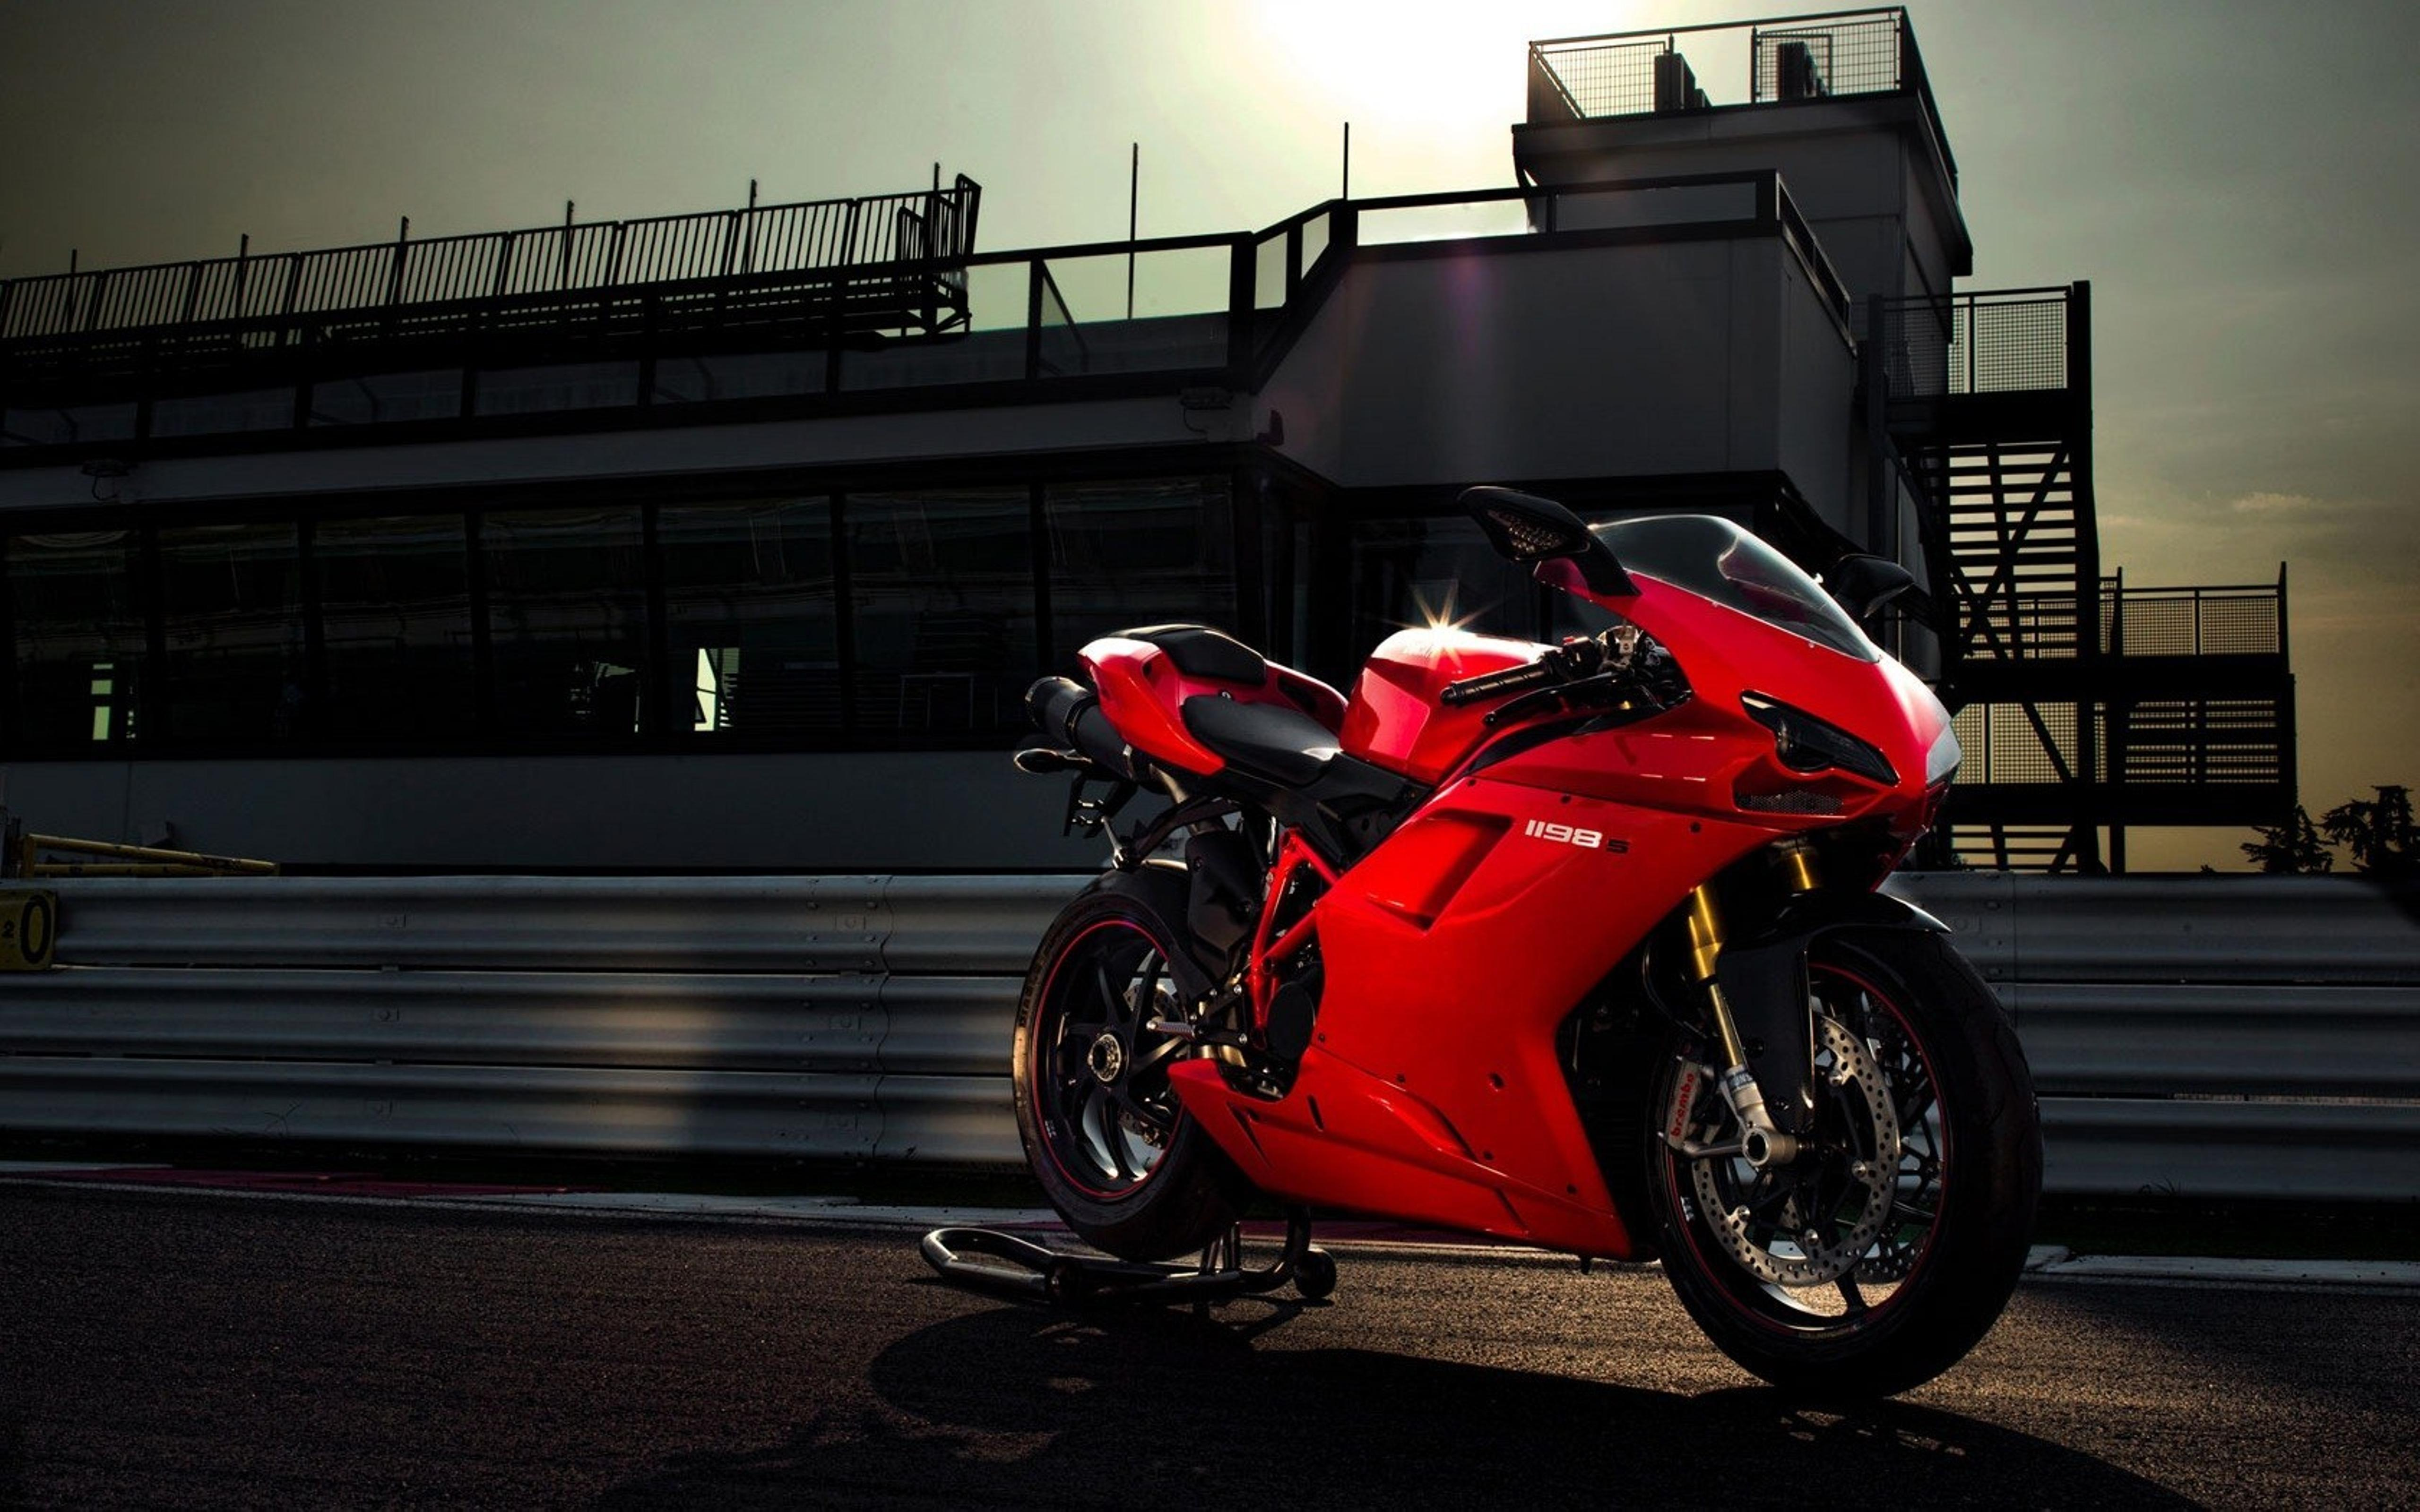 beautiful red ducati 1198 motorcycle wallpaper download 5120x3200